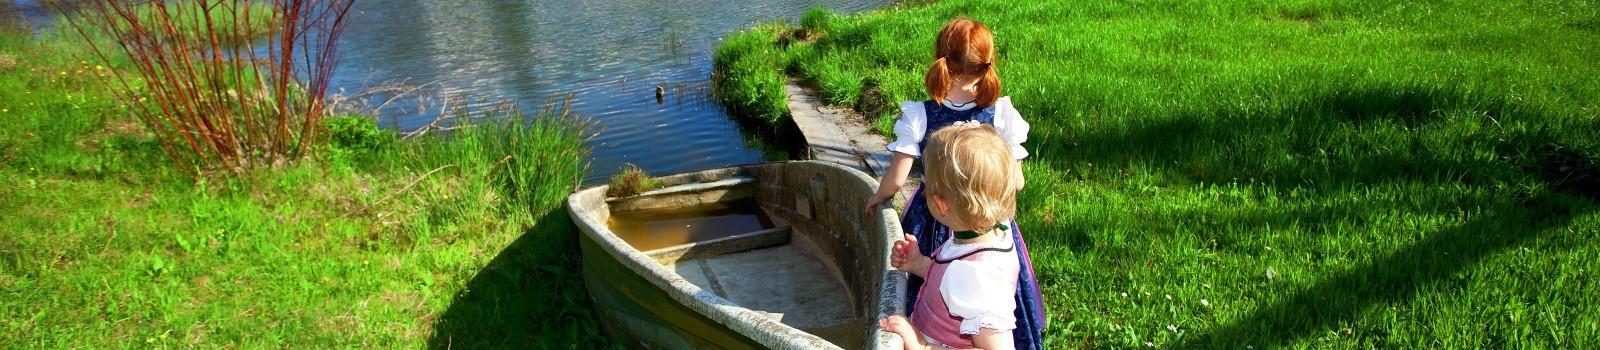 Urlaub mit Kindern im Haus Almblick